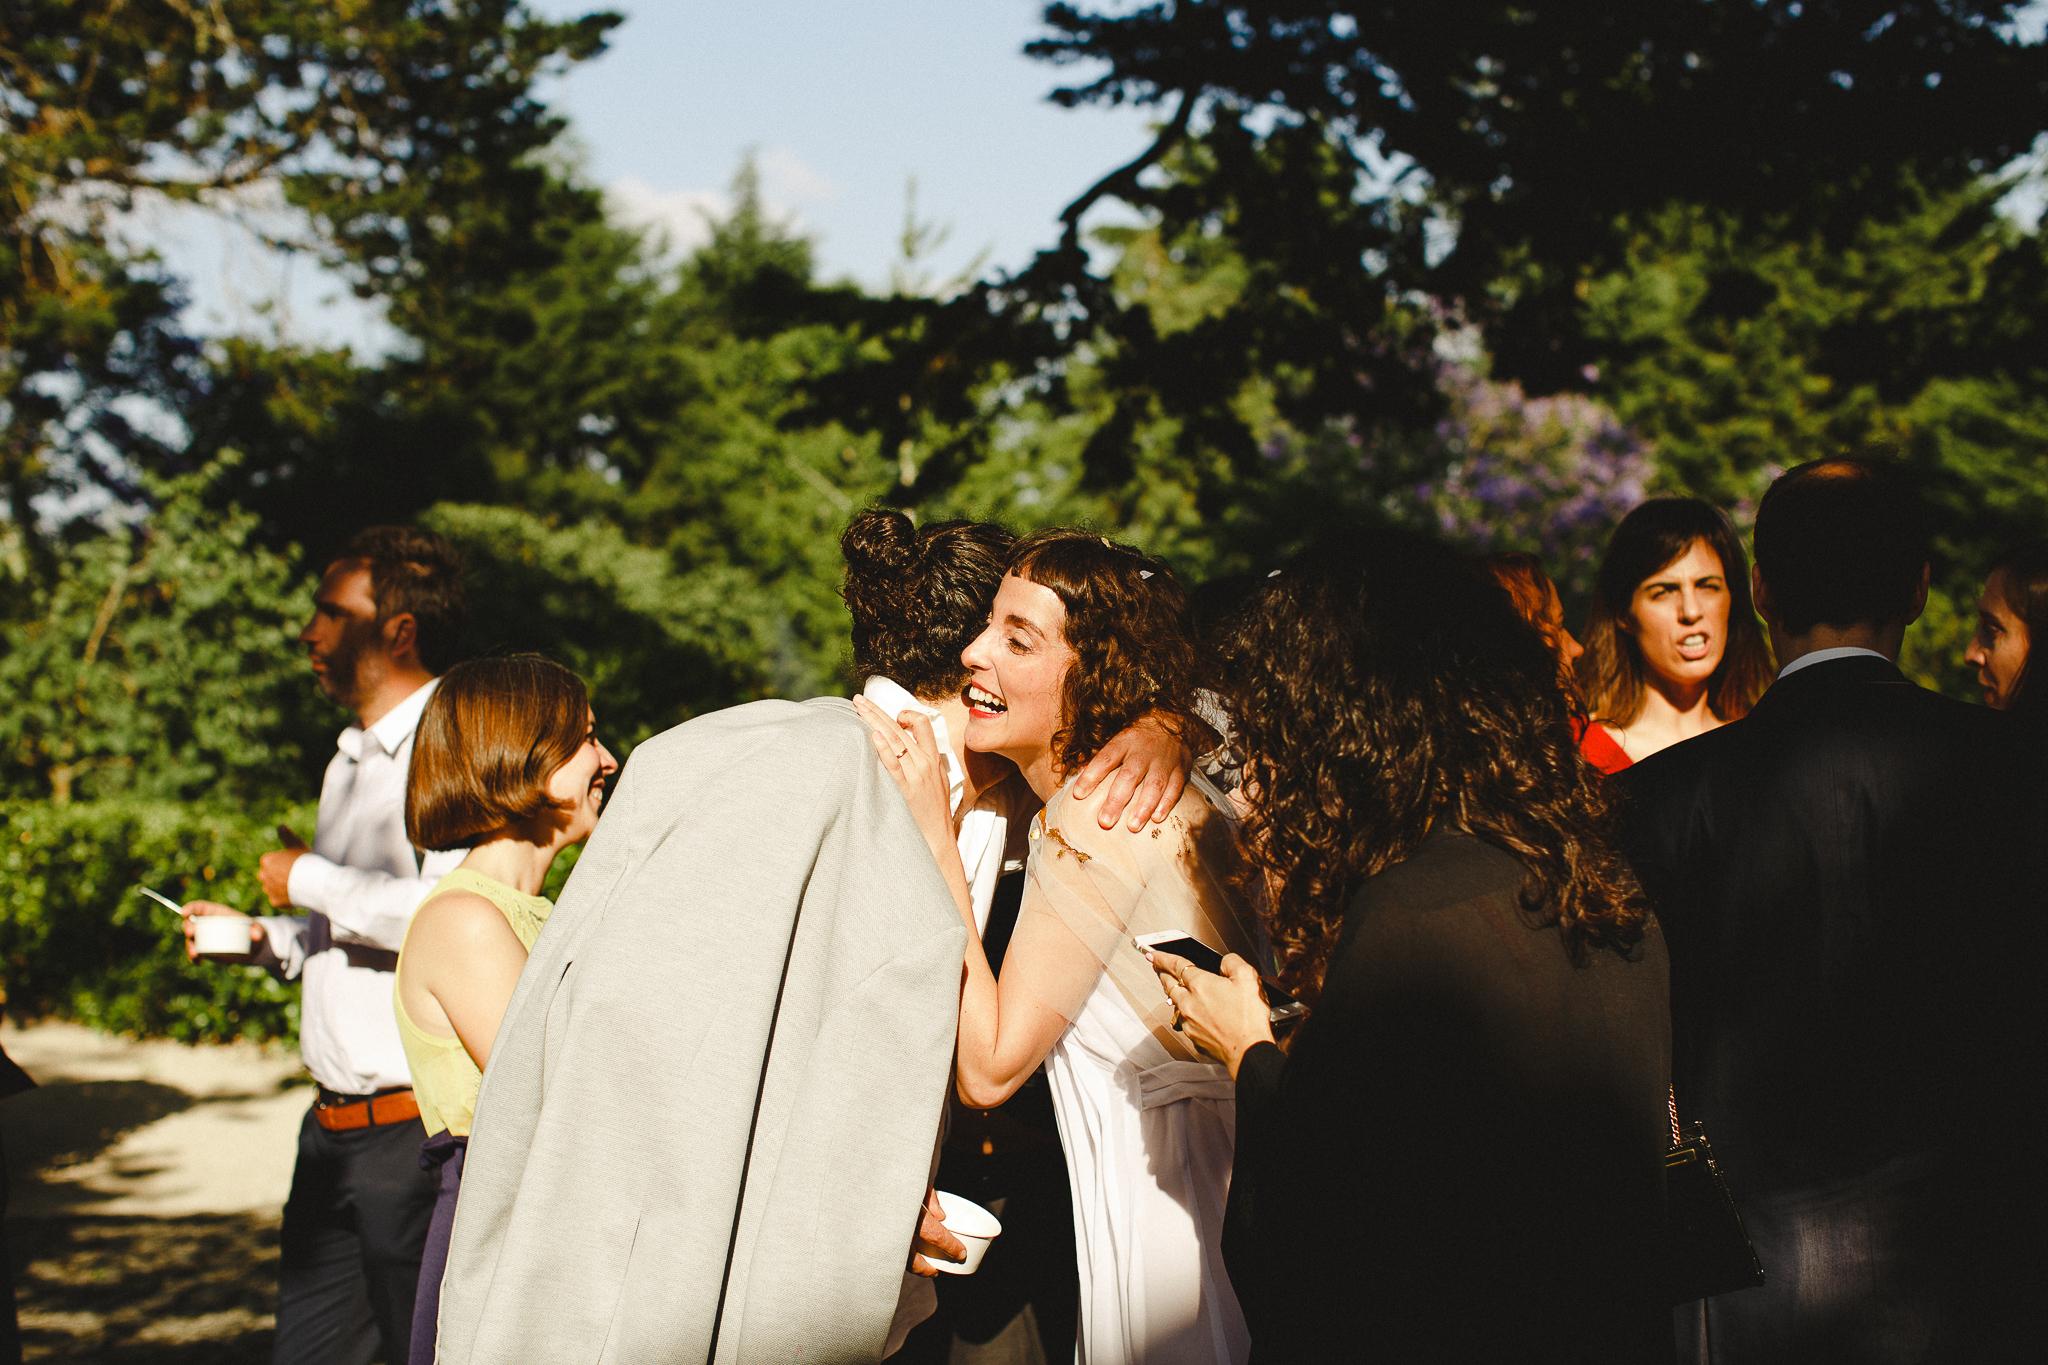 Wedding Photography Portugal, Fotografia de Casamento Convento de Sandelgas, Coimbra, Portugal Wedding Photographer Hello Twiggs